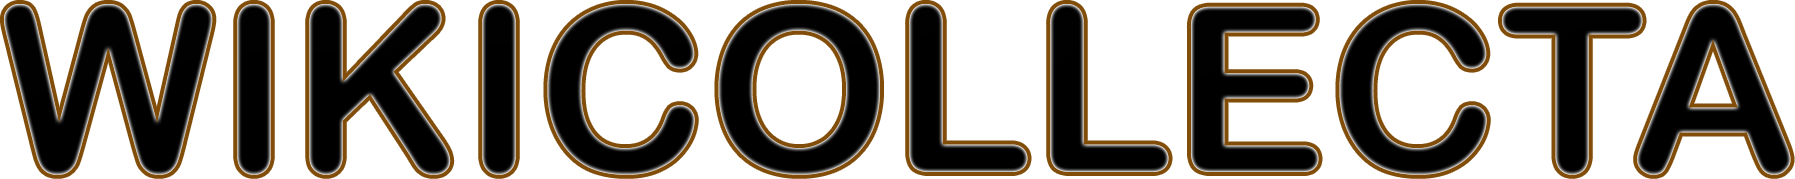 Wiki Collecta